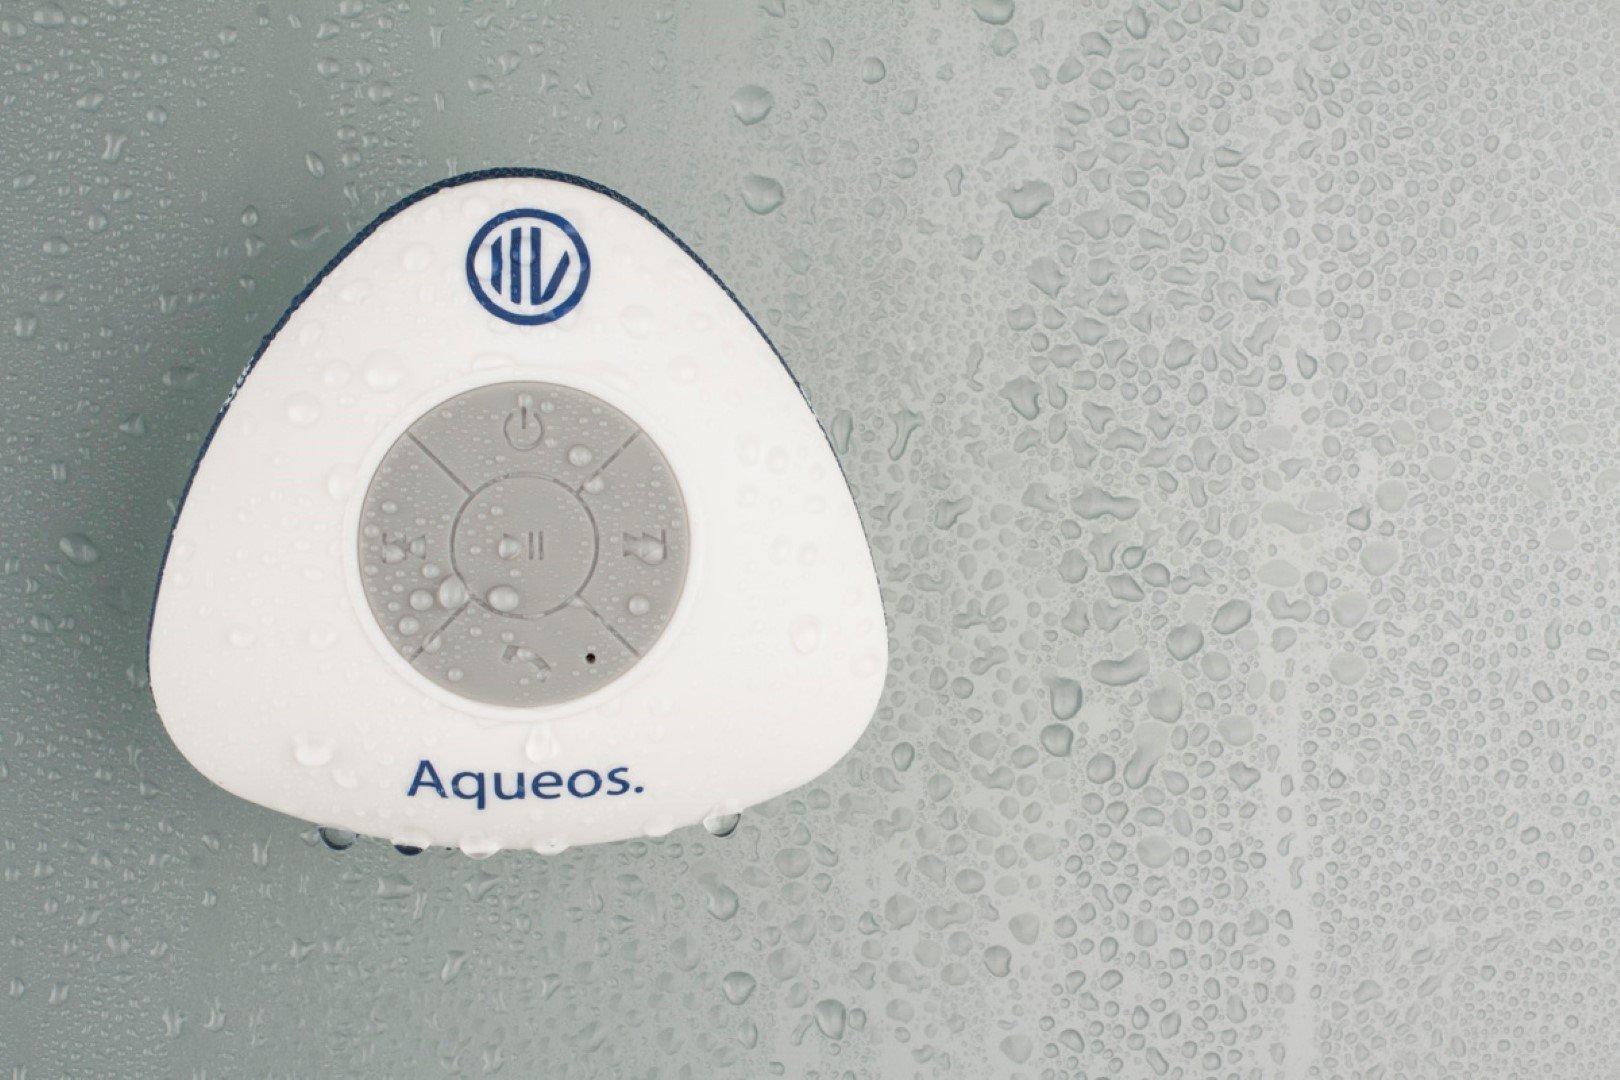 iiVO Waterproof Bluetooth Suction Shower Speaker